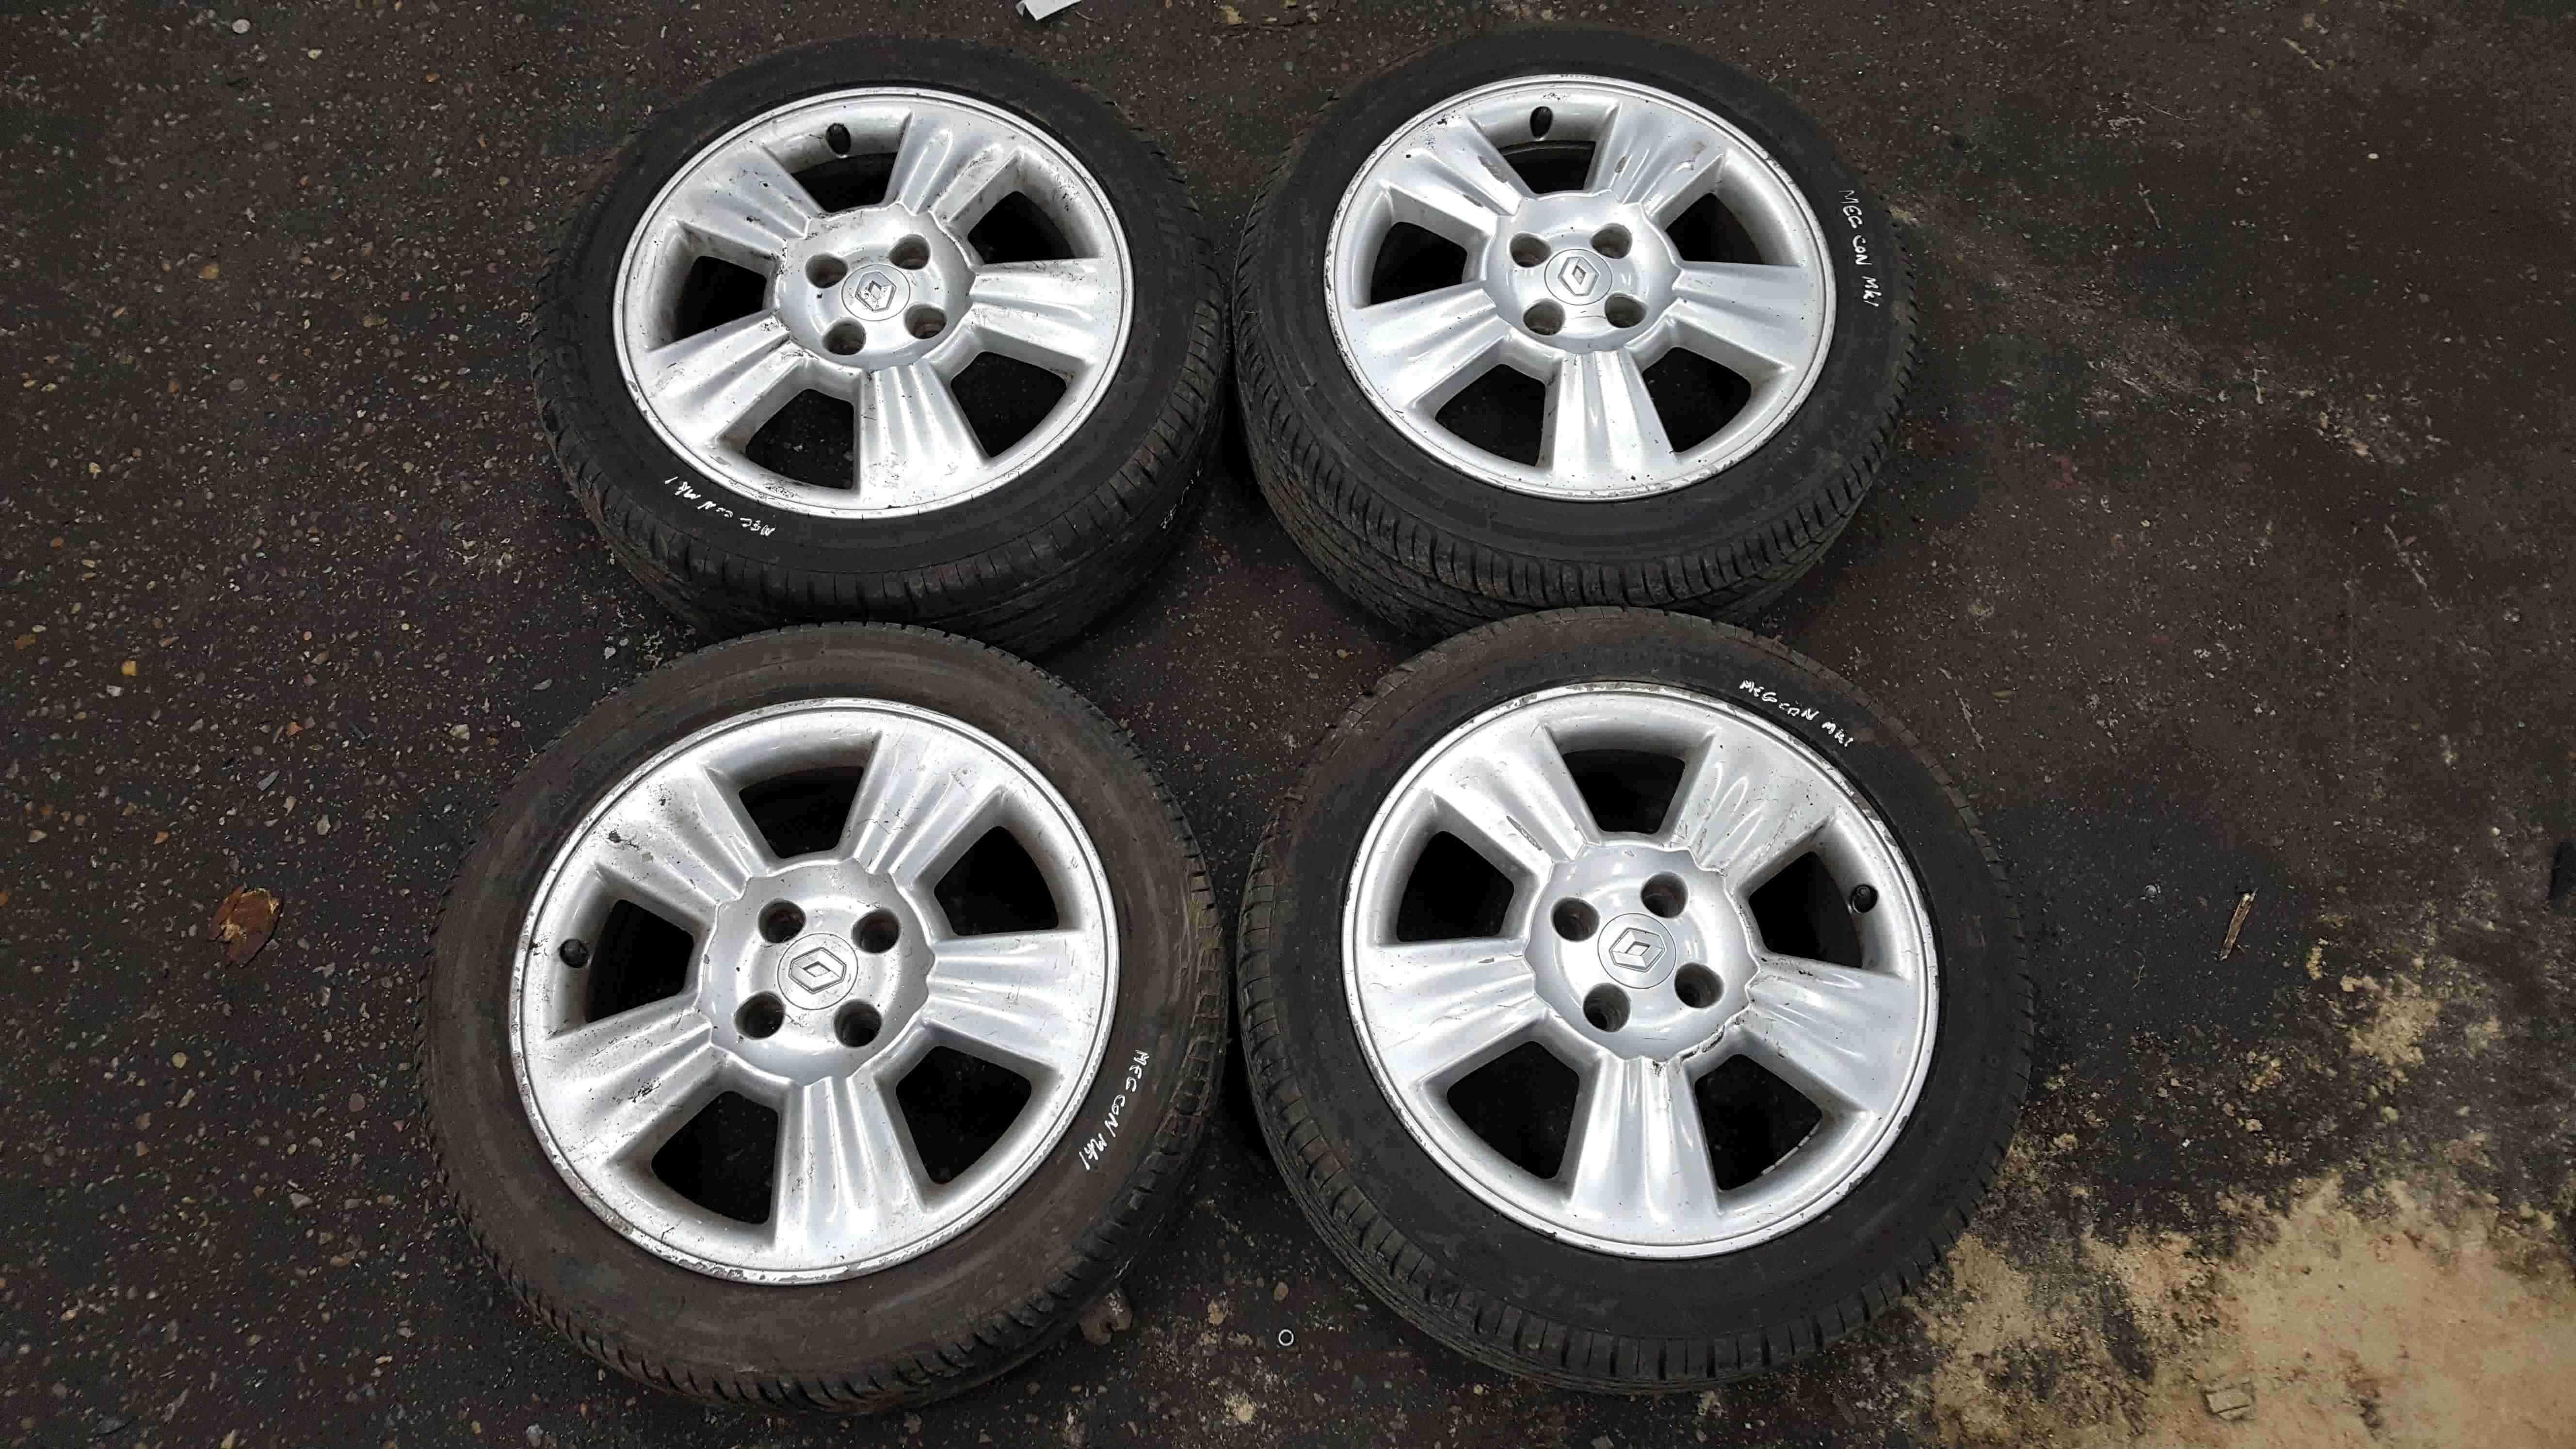 Renault Megane Con MK1 1999-2002 Lyra Alloy Wheels Set X4 15inch + Good Tyres